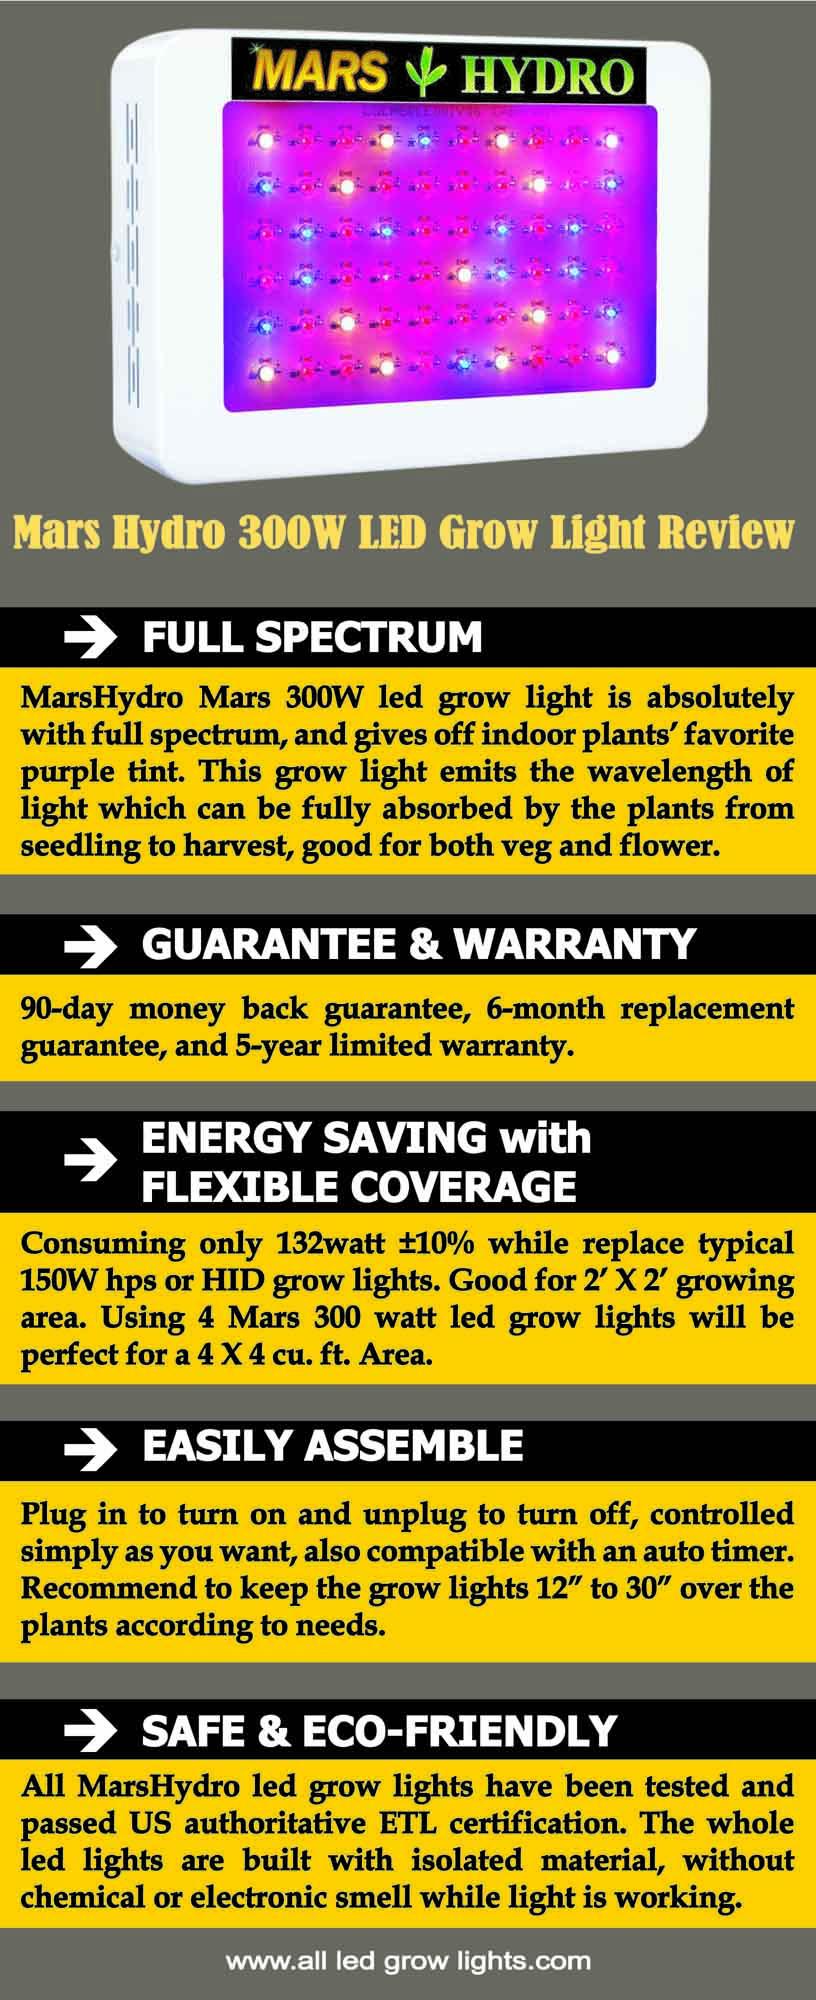 Mars Hydro 300W led grow light review info graph